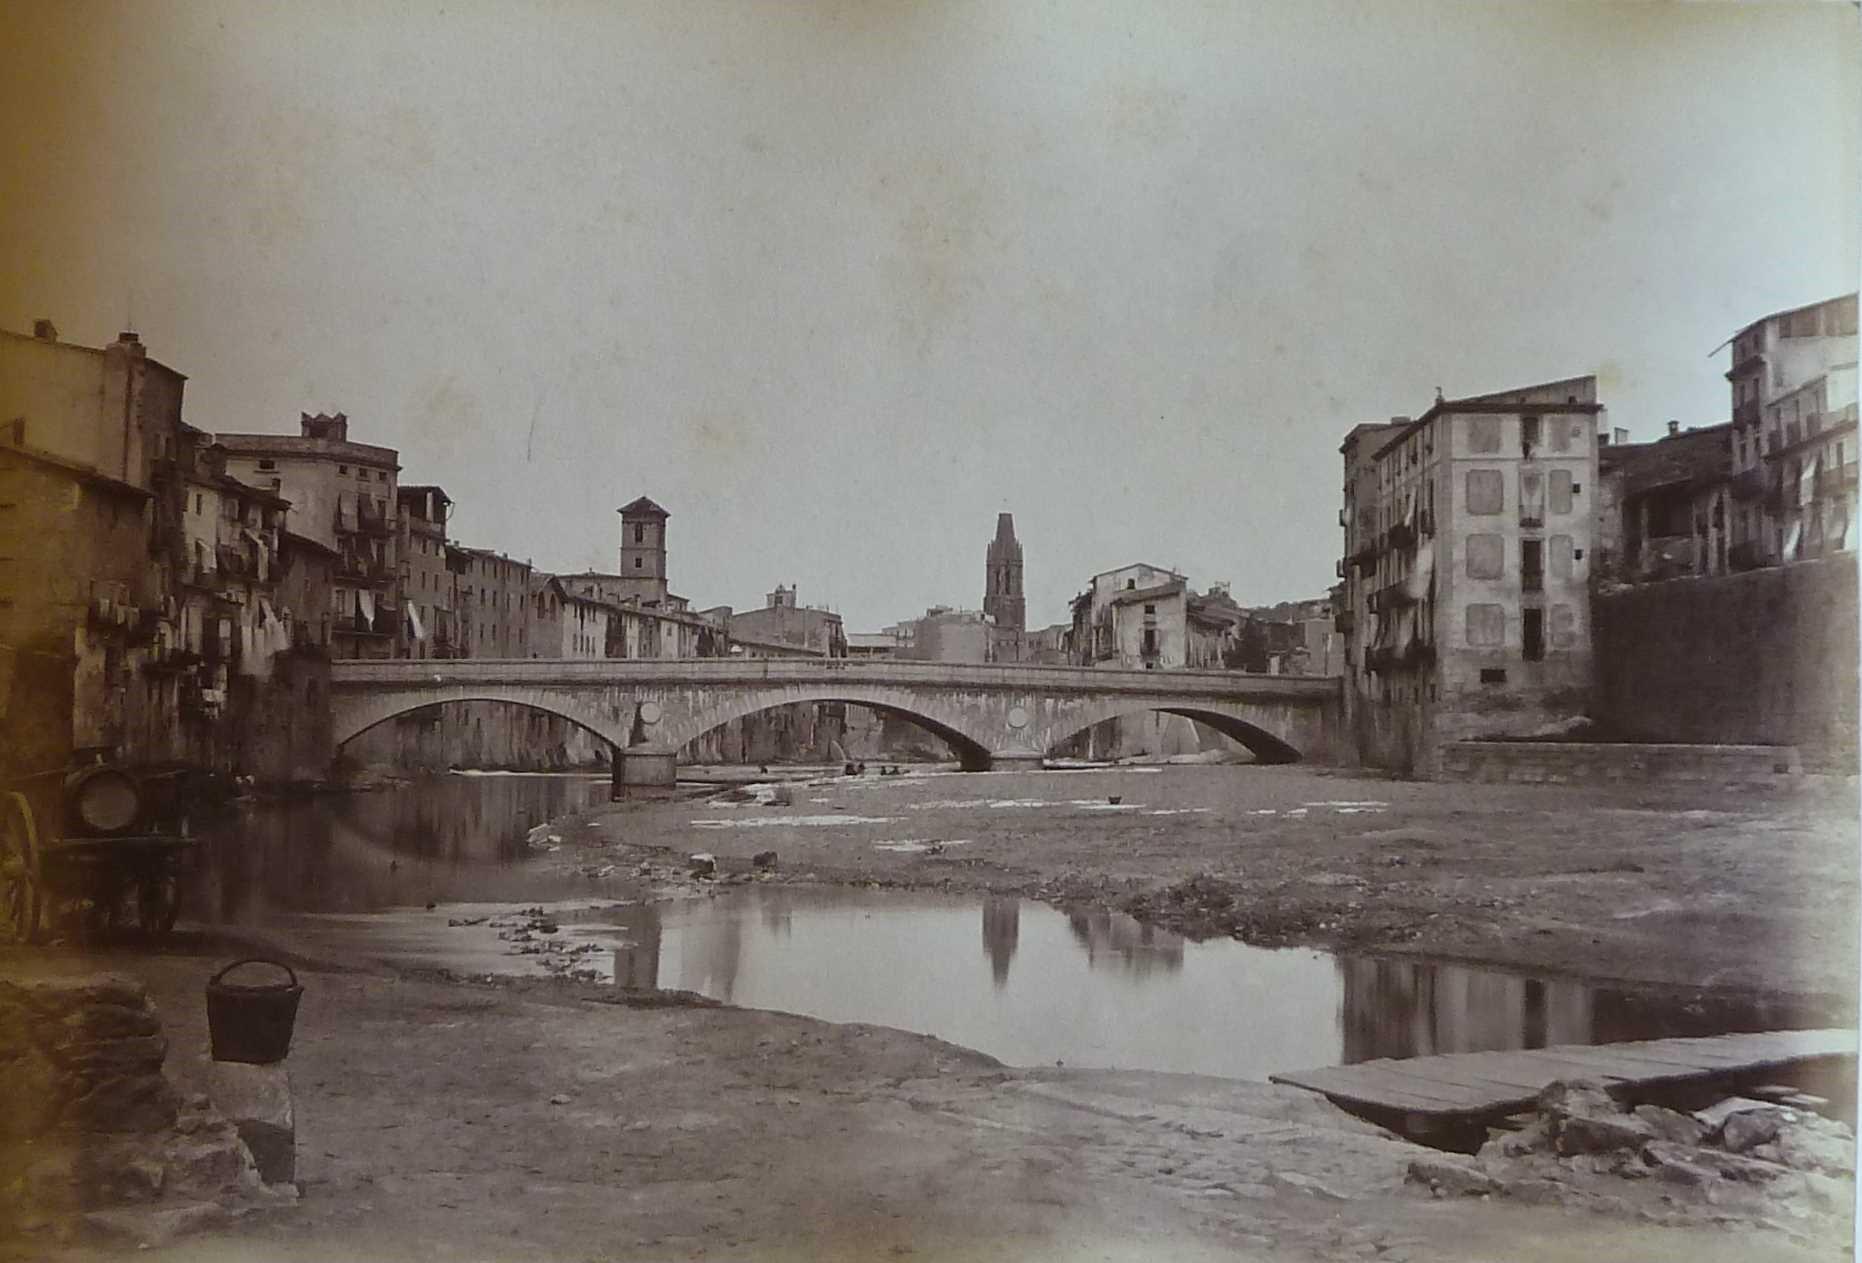 Pont de pedra de Girona inaugurat l'any 1856